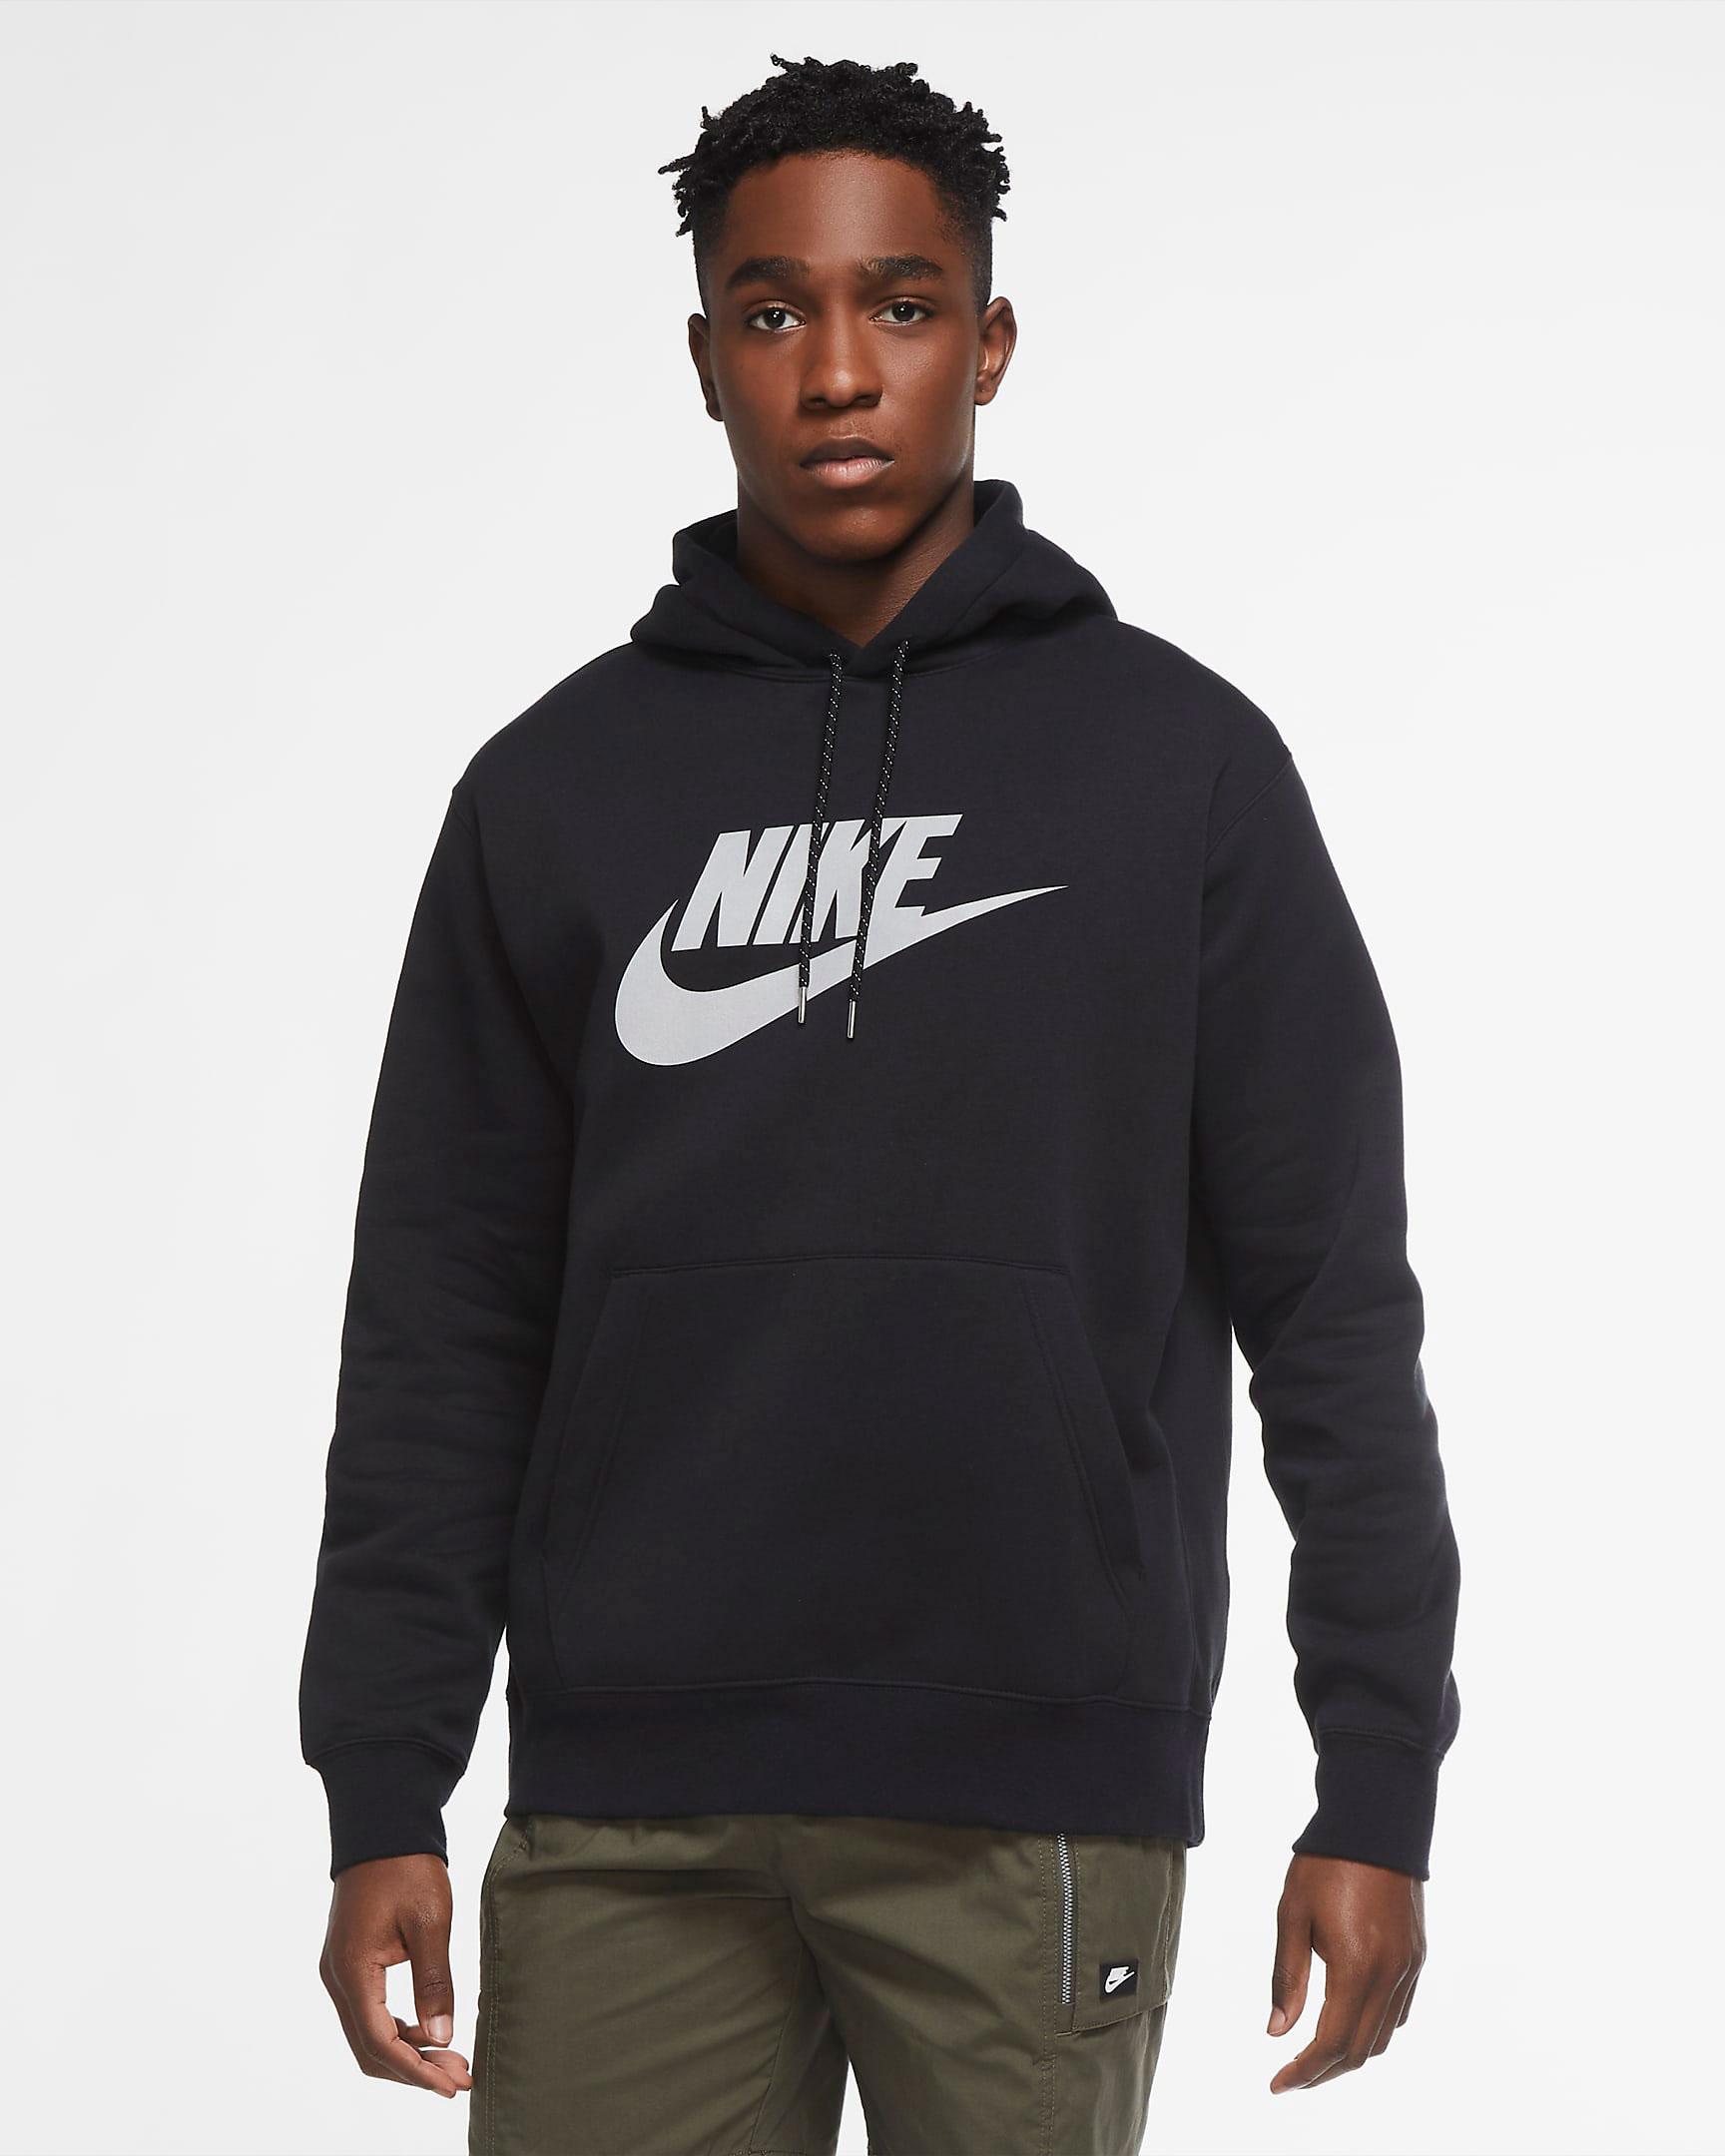 nike-adapt-auto-max-triple-black-hoodie-1